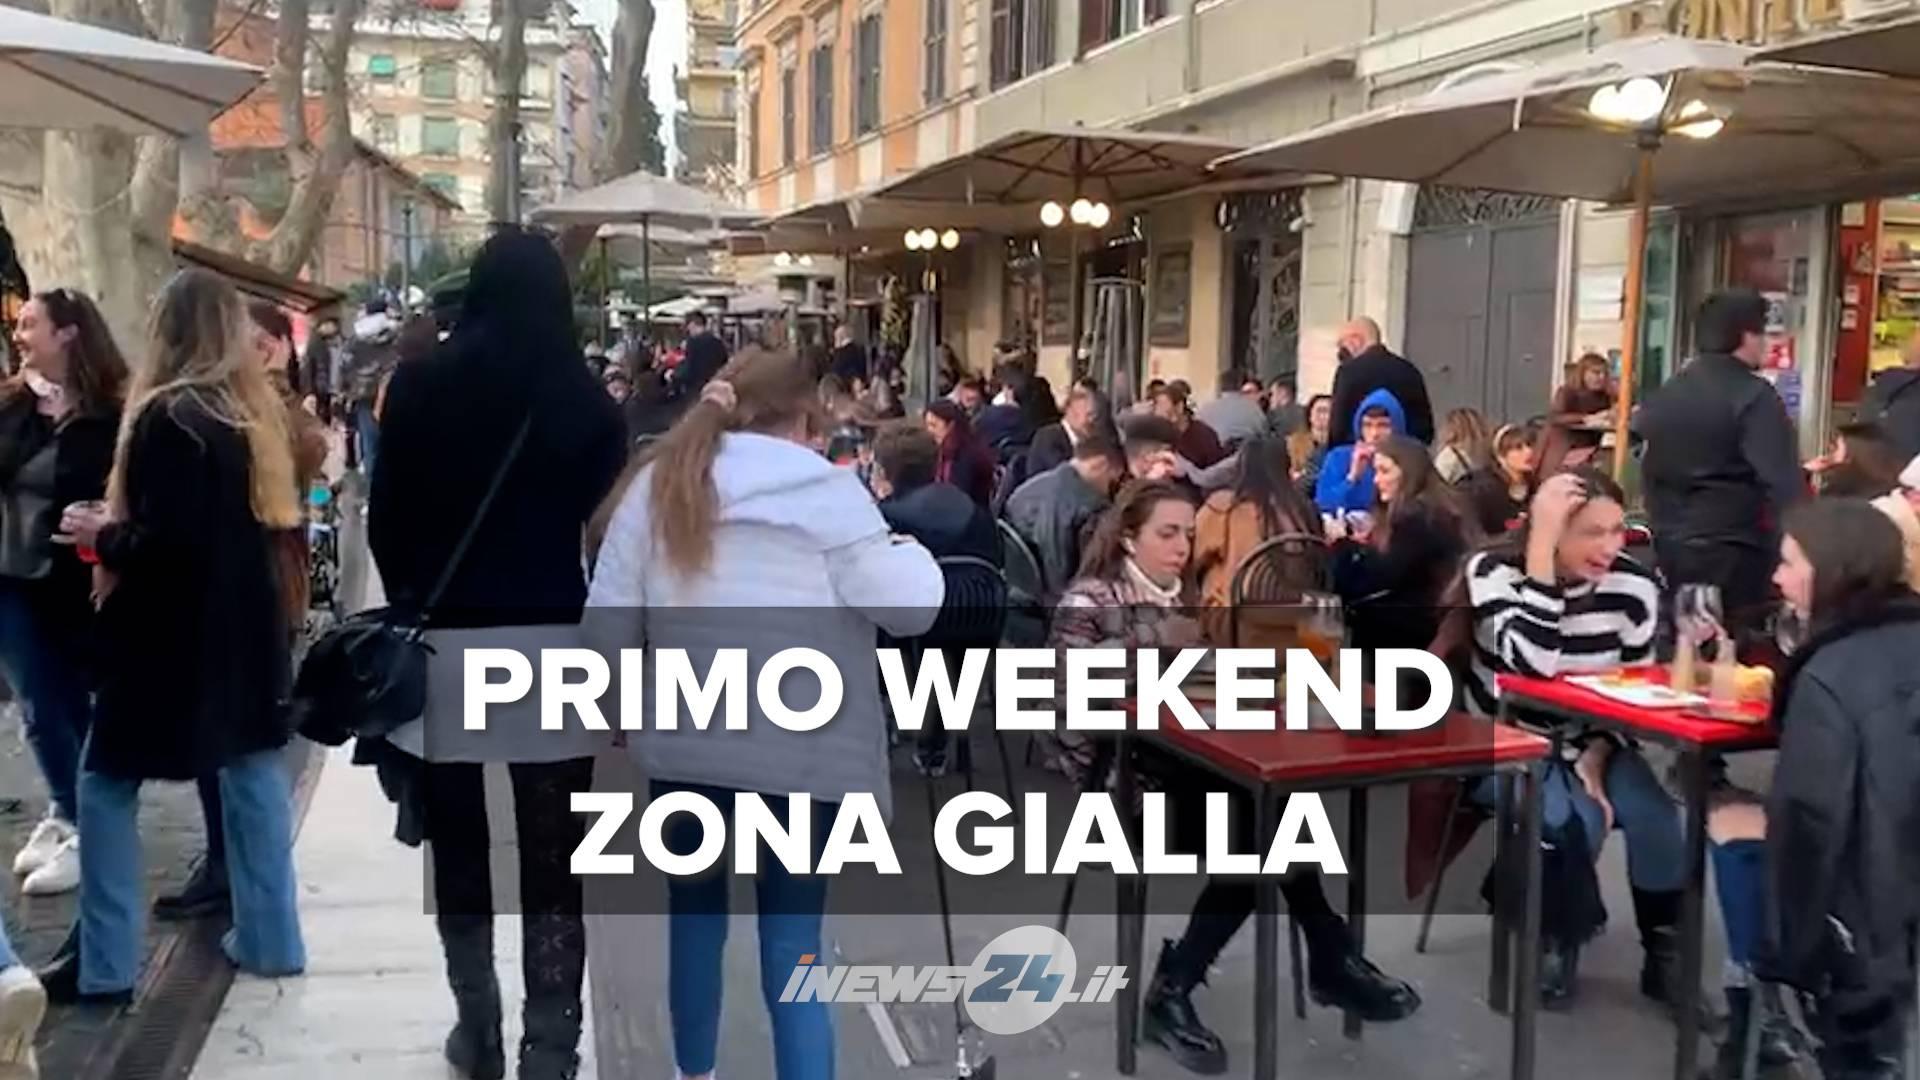 zona gialla roma